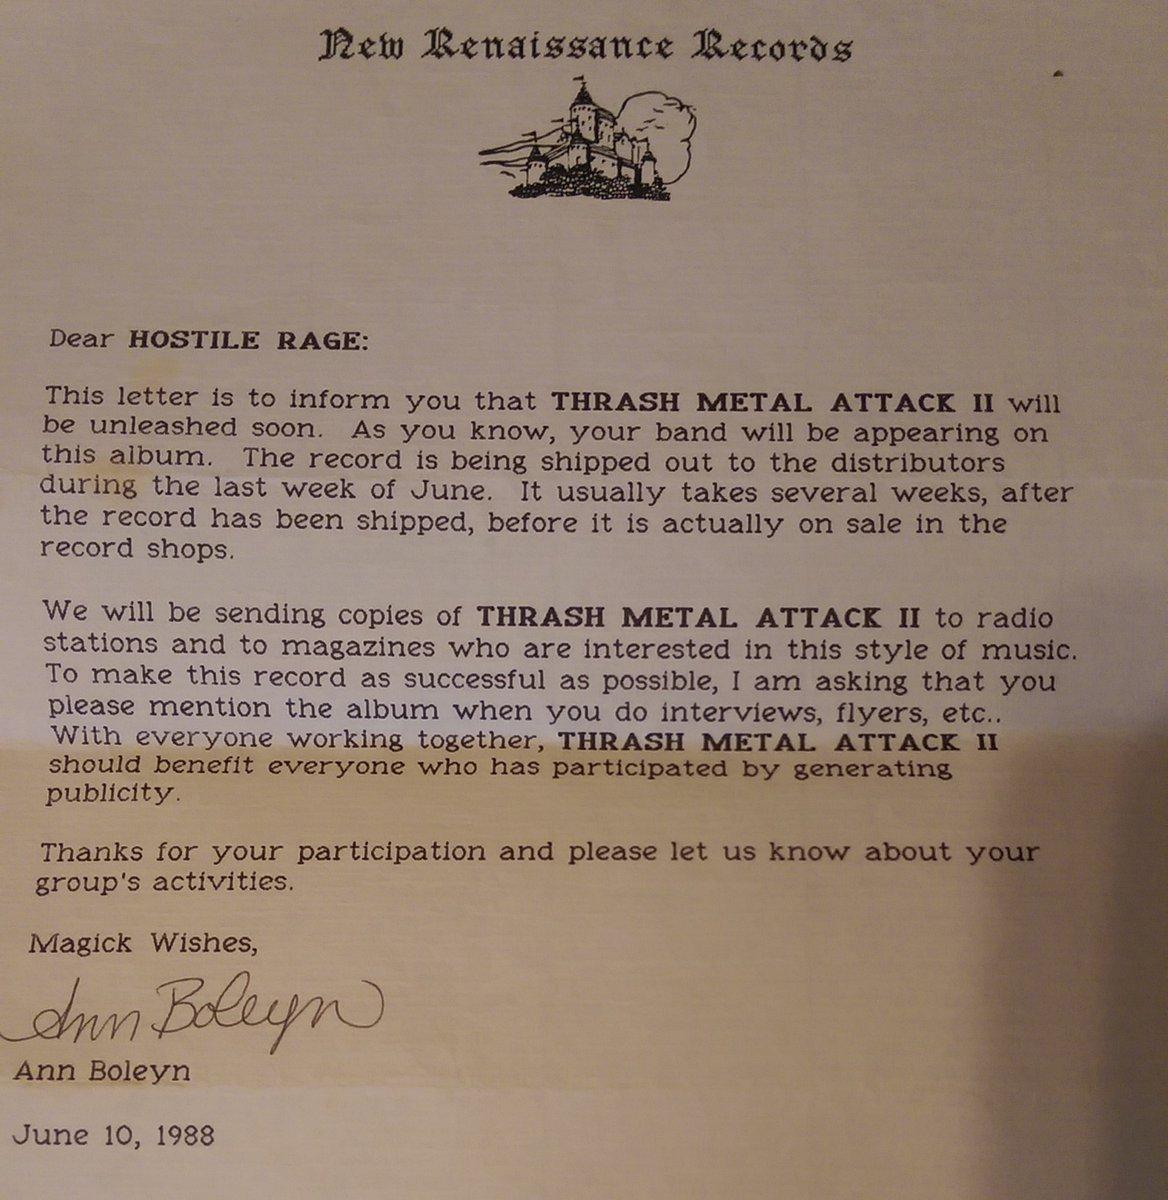 TBT mail..#heavymetalmusic #heavymetalband #newrennaissancerecords #metalforever #metalforcesmagazine #metalmusic #metalheadsofinstagram #metalband #metallicafan #thrash_metal #thrashmetalband #heavymetalgirl #aquarianmagazine #nj #newjersey #ramseynj #testamentfans #metalgirlpic.twitter.com/puNyrfWNPl